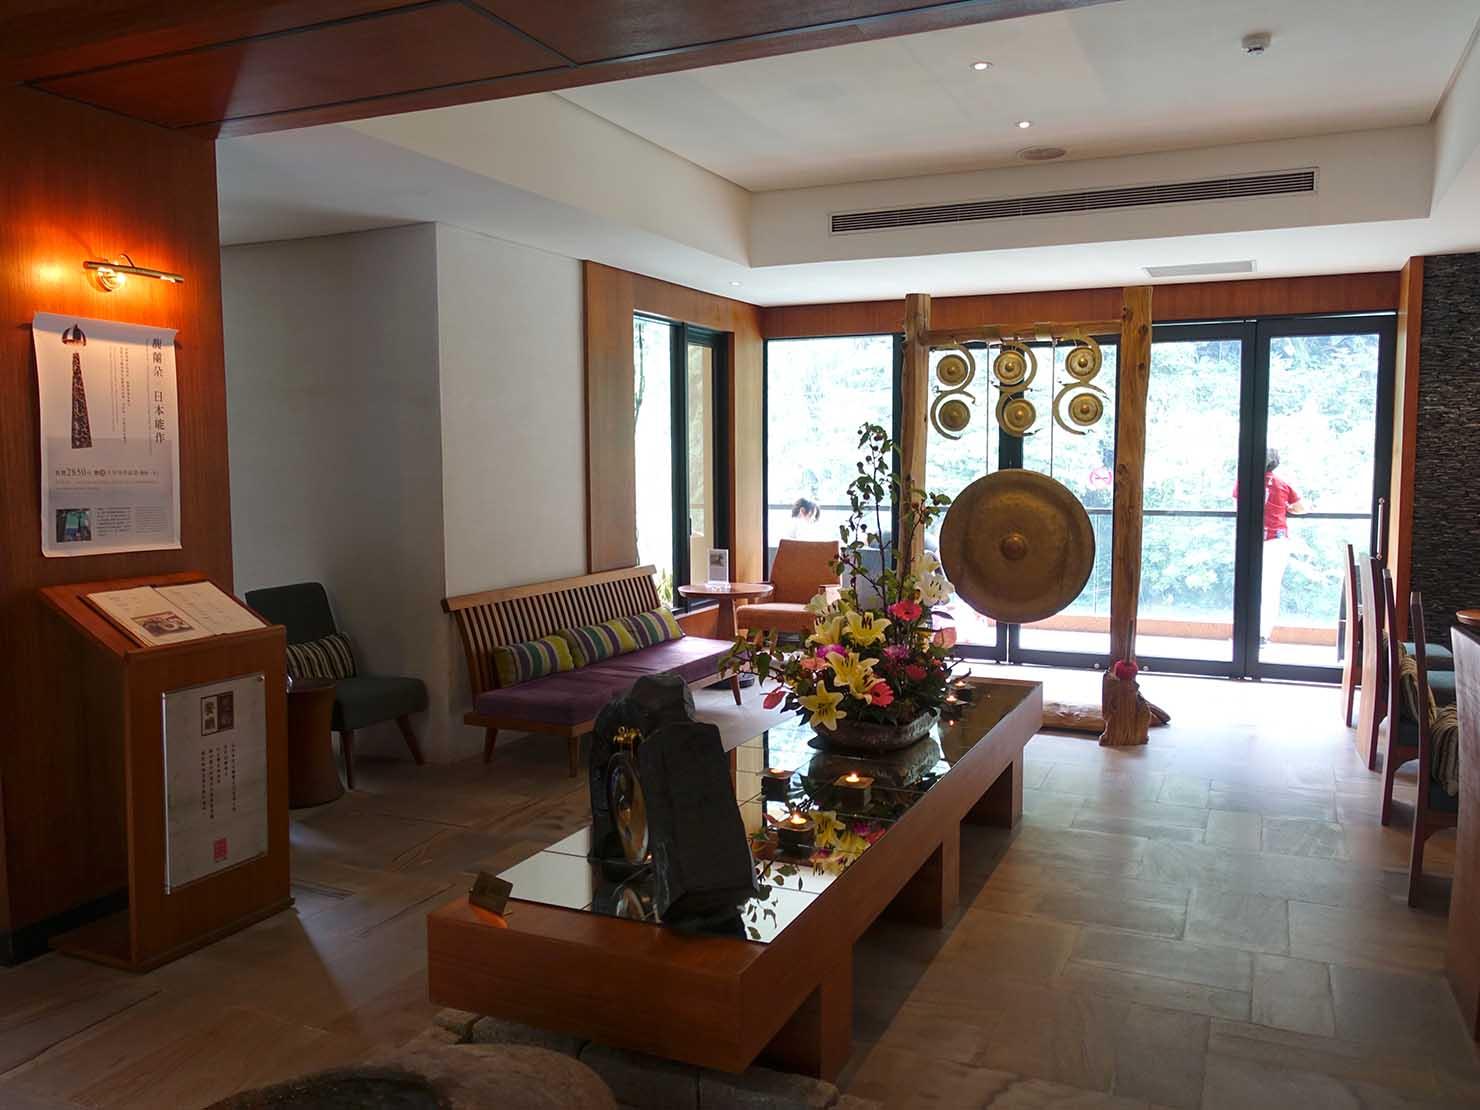 台北・烏來温泉「Volando Urai Spring Spa & Resort 馥蘭朵烏來渡假酒」のロビー